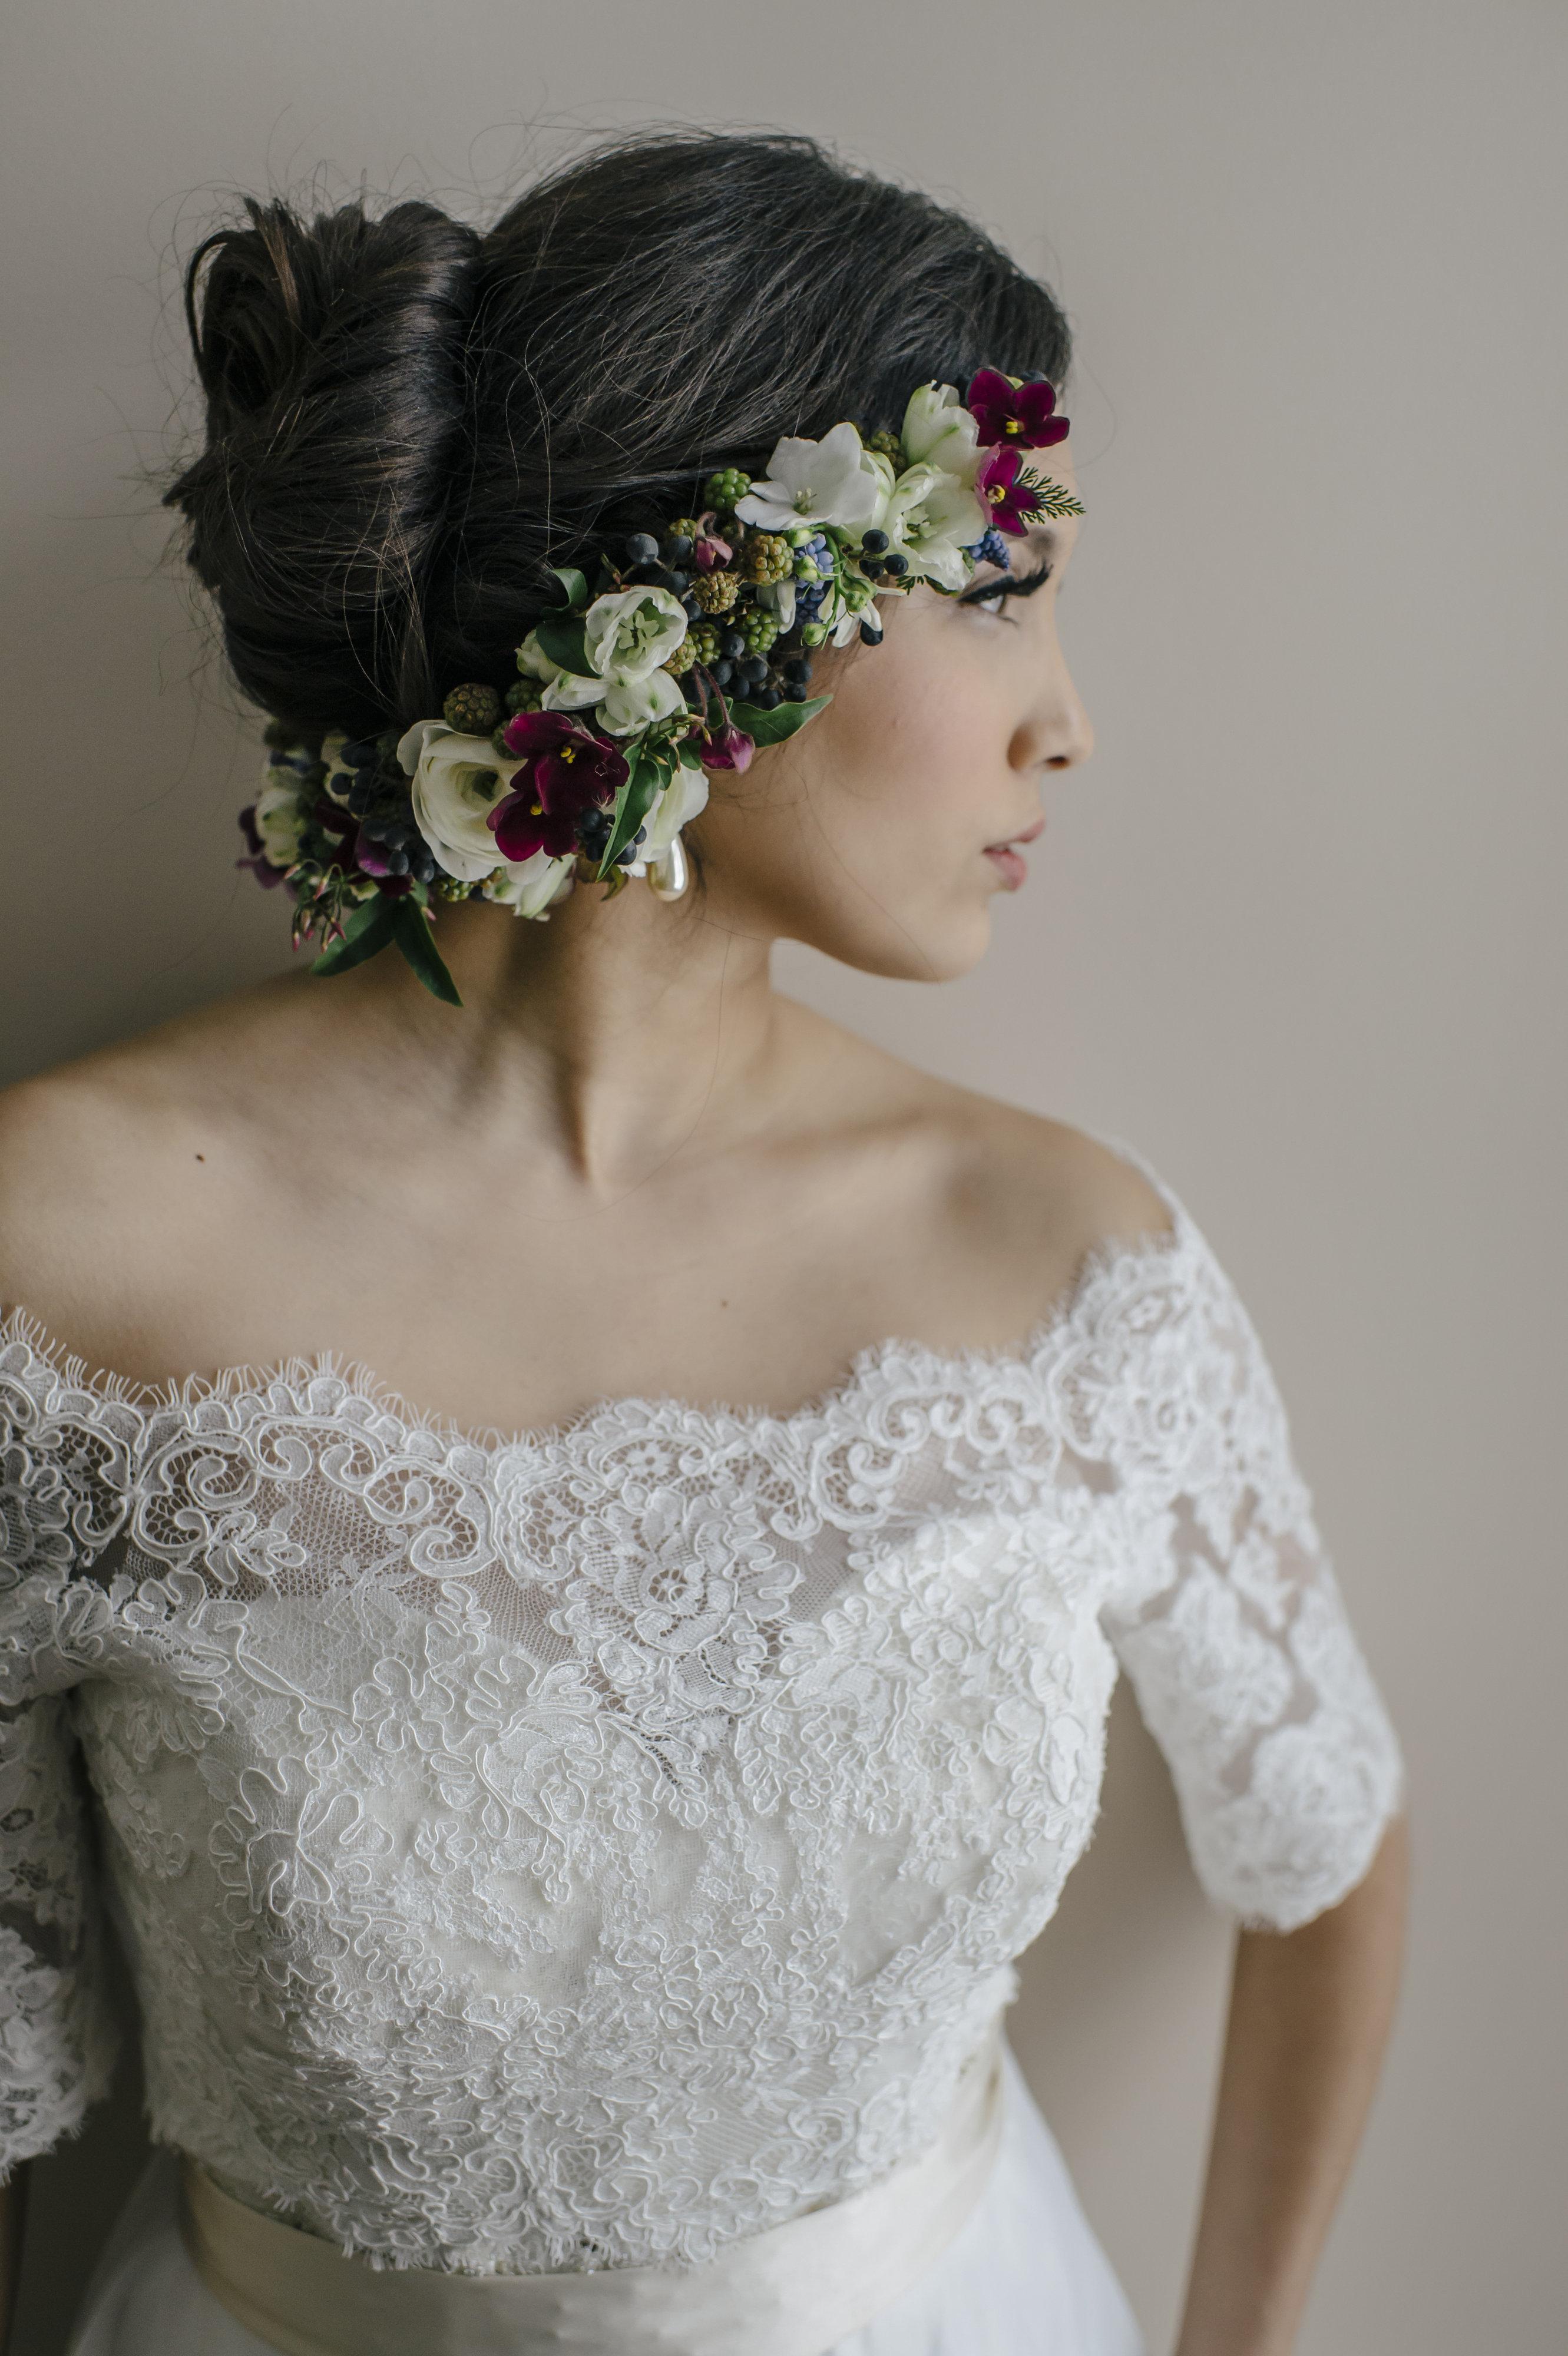 Bridal Fashion Trends Forecast 2016 | Junebug Weddings